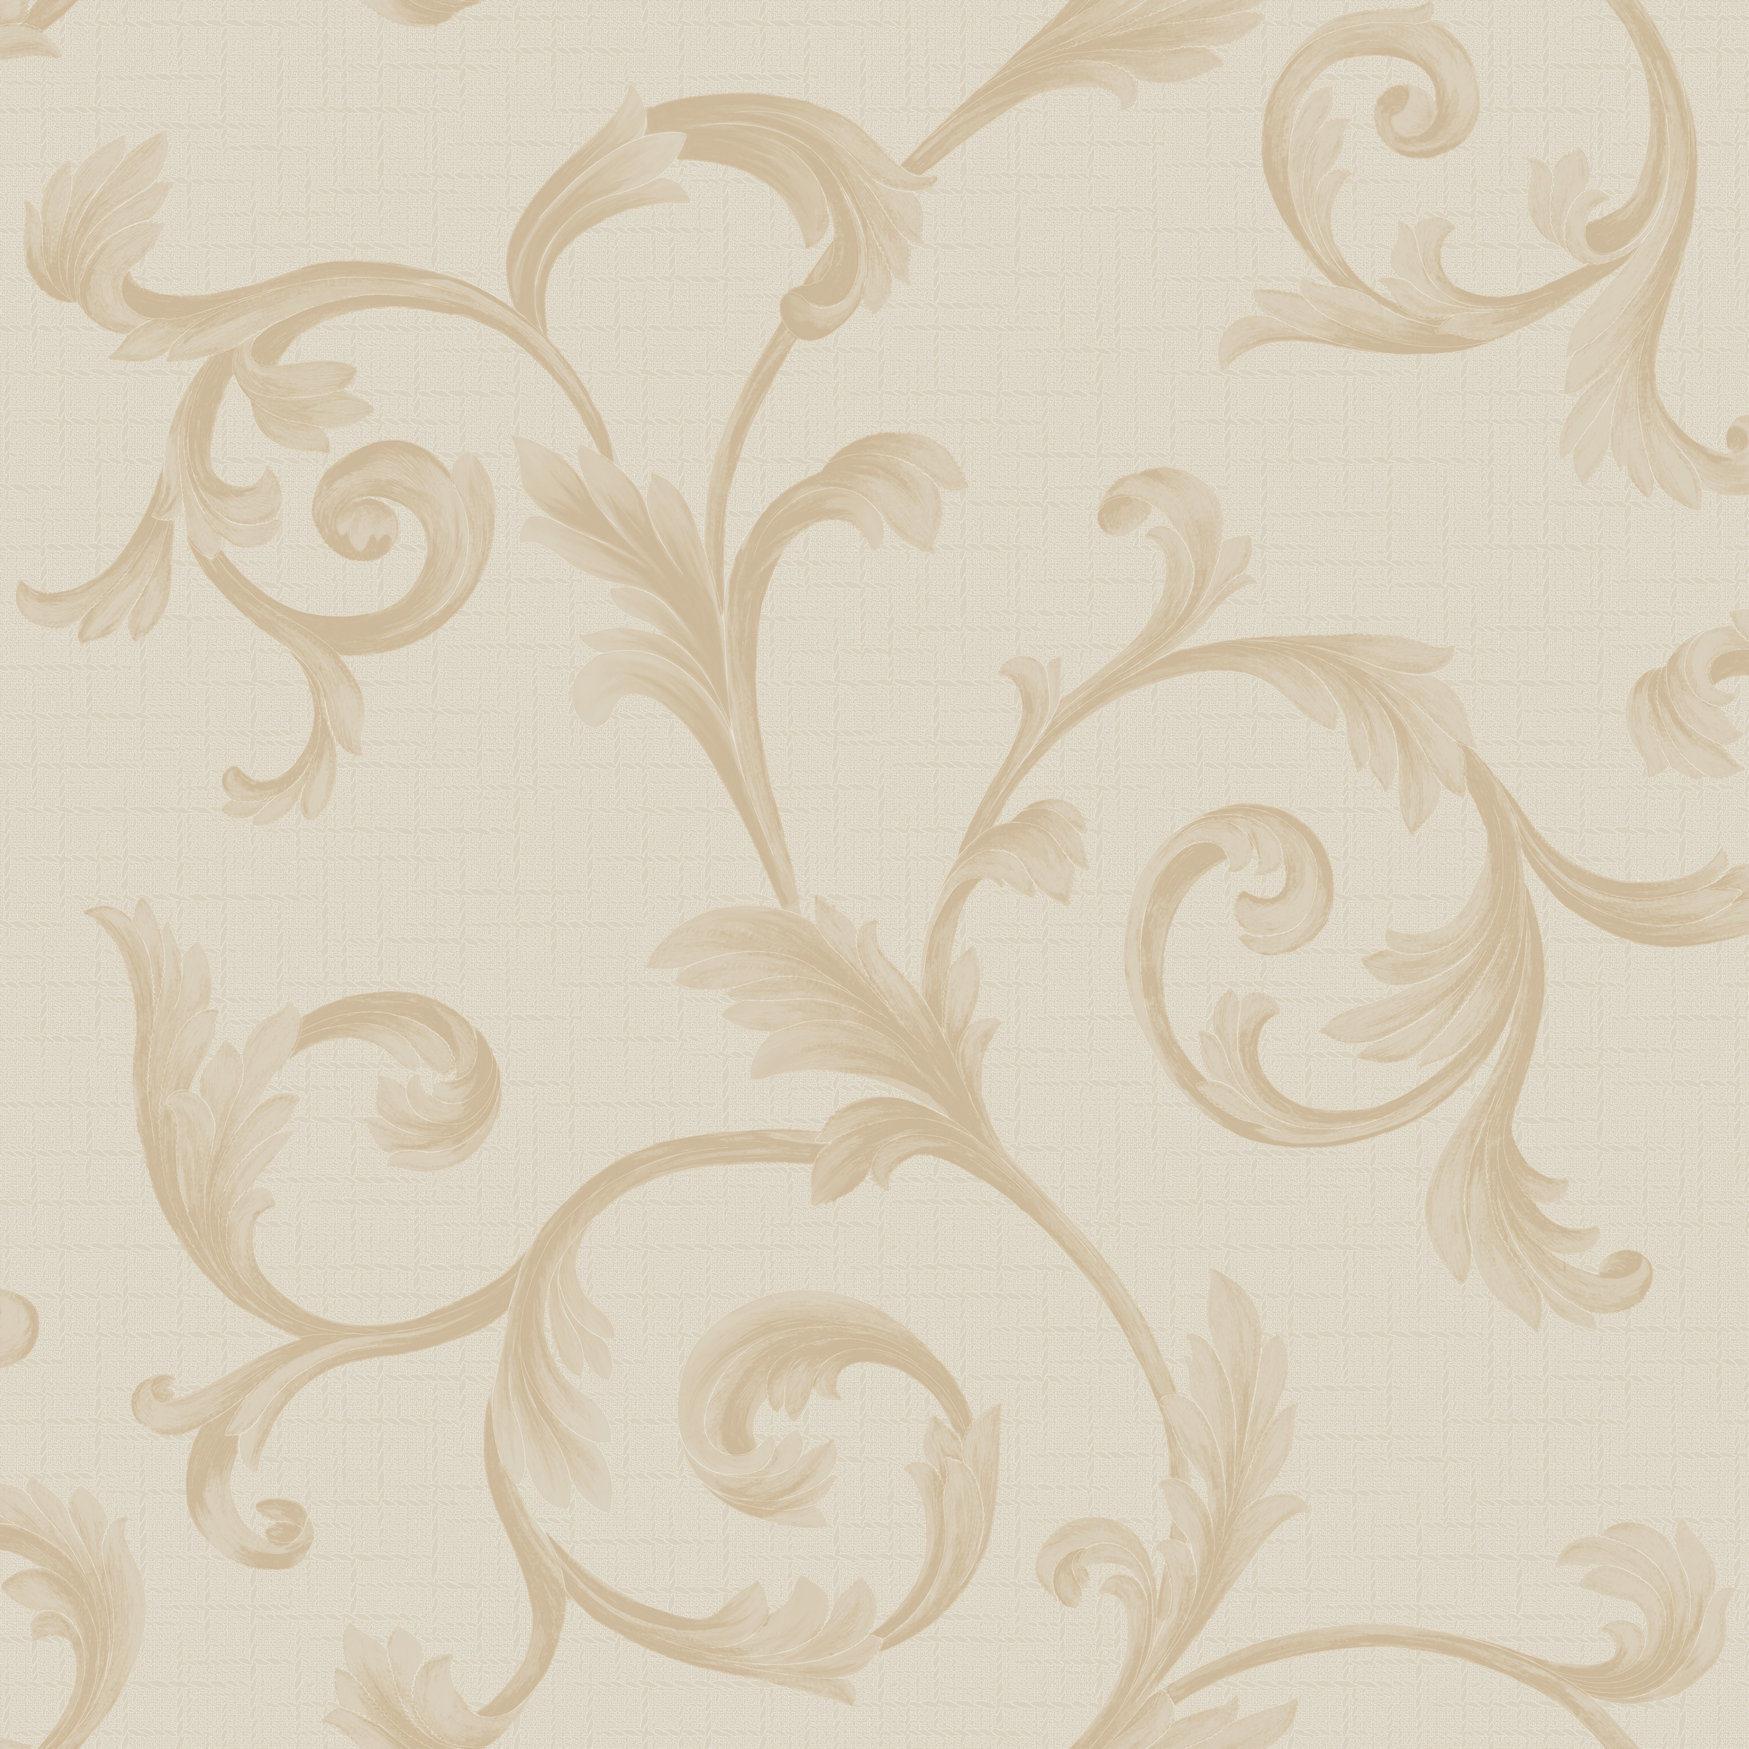 china interior decorative wall paper rolls home wallpaper photos